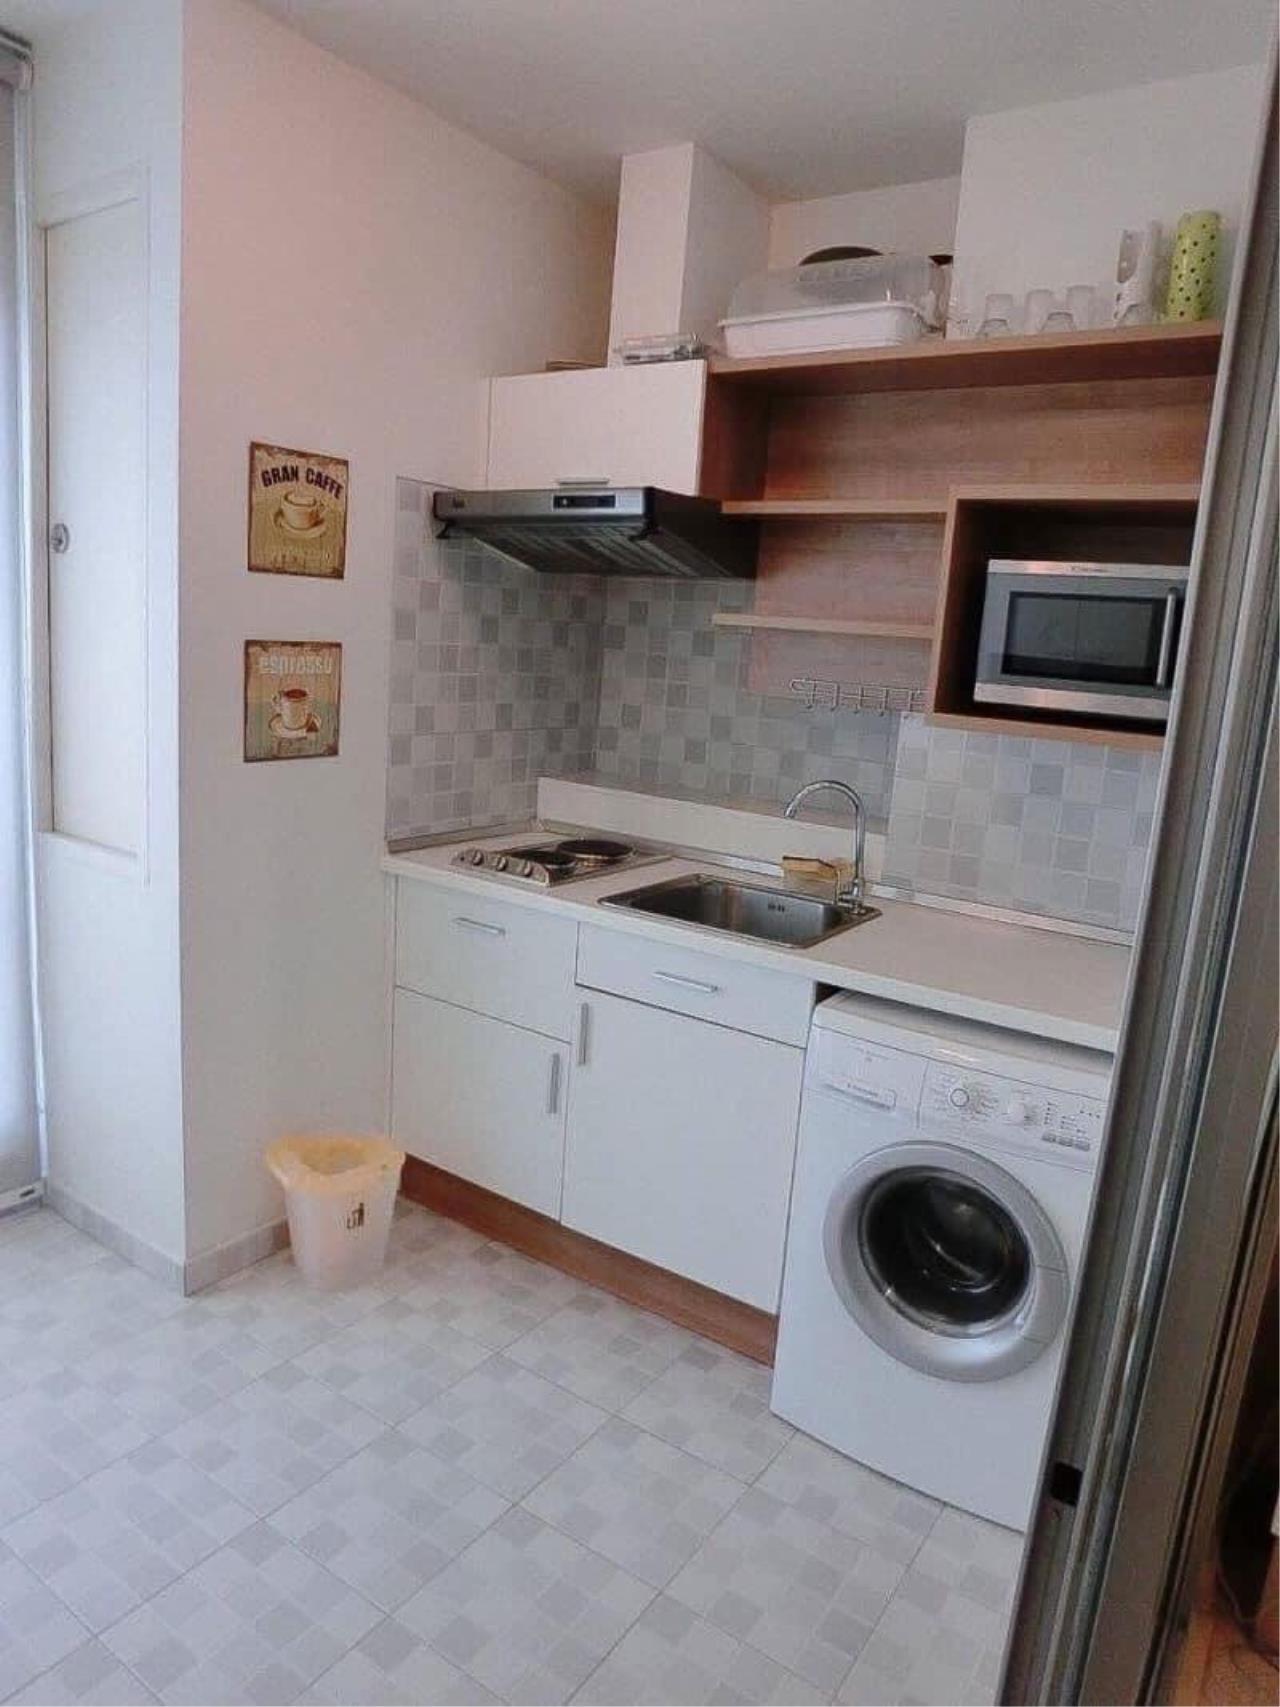 Agent - Phapayawarin Agency's Centric Scene Ratchavipha for Sale, 2 Bedroom 2 Bathroom, 75 Sq.m. 7